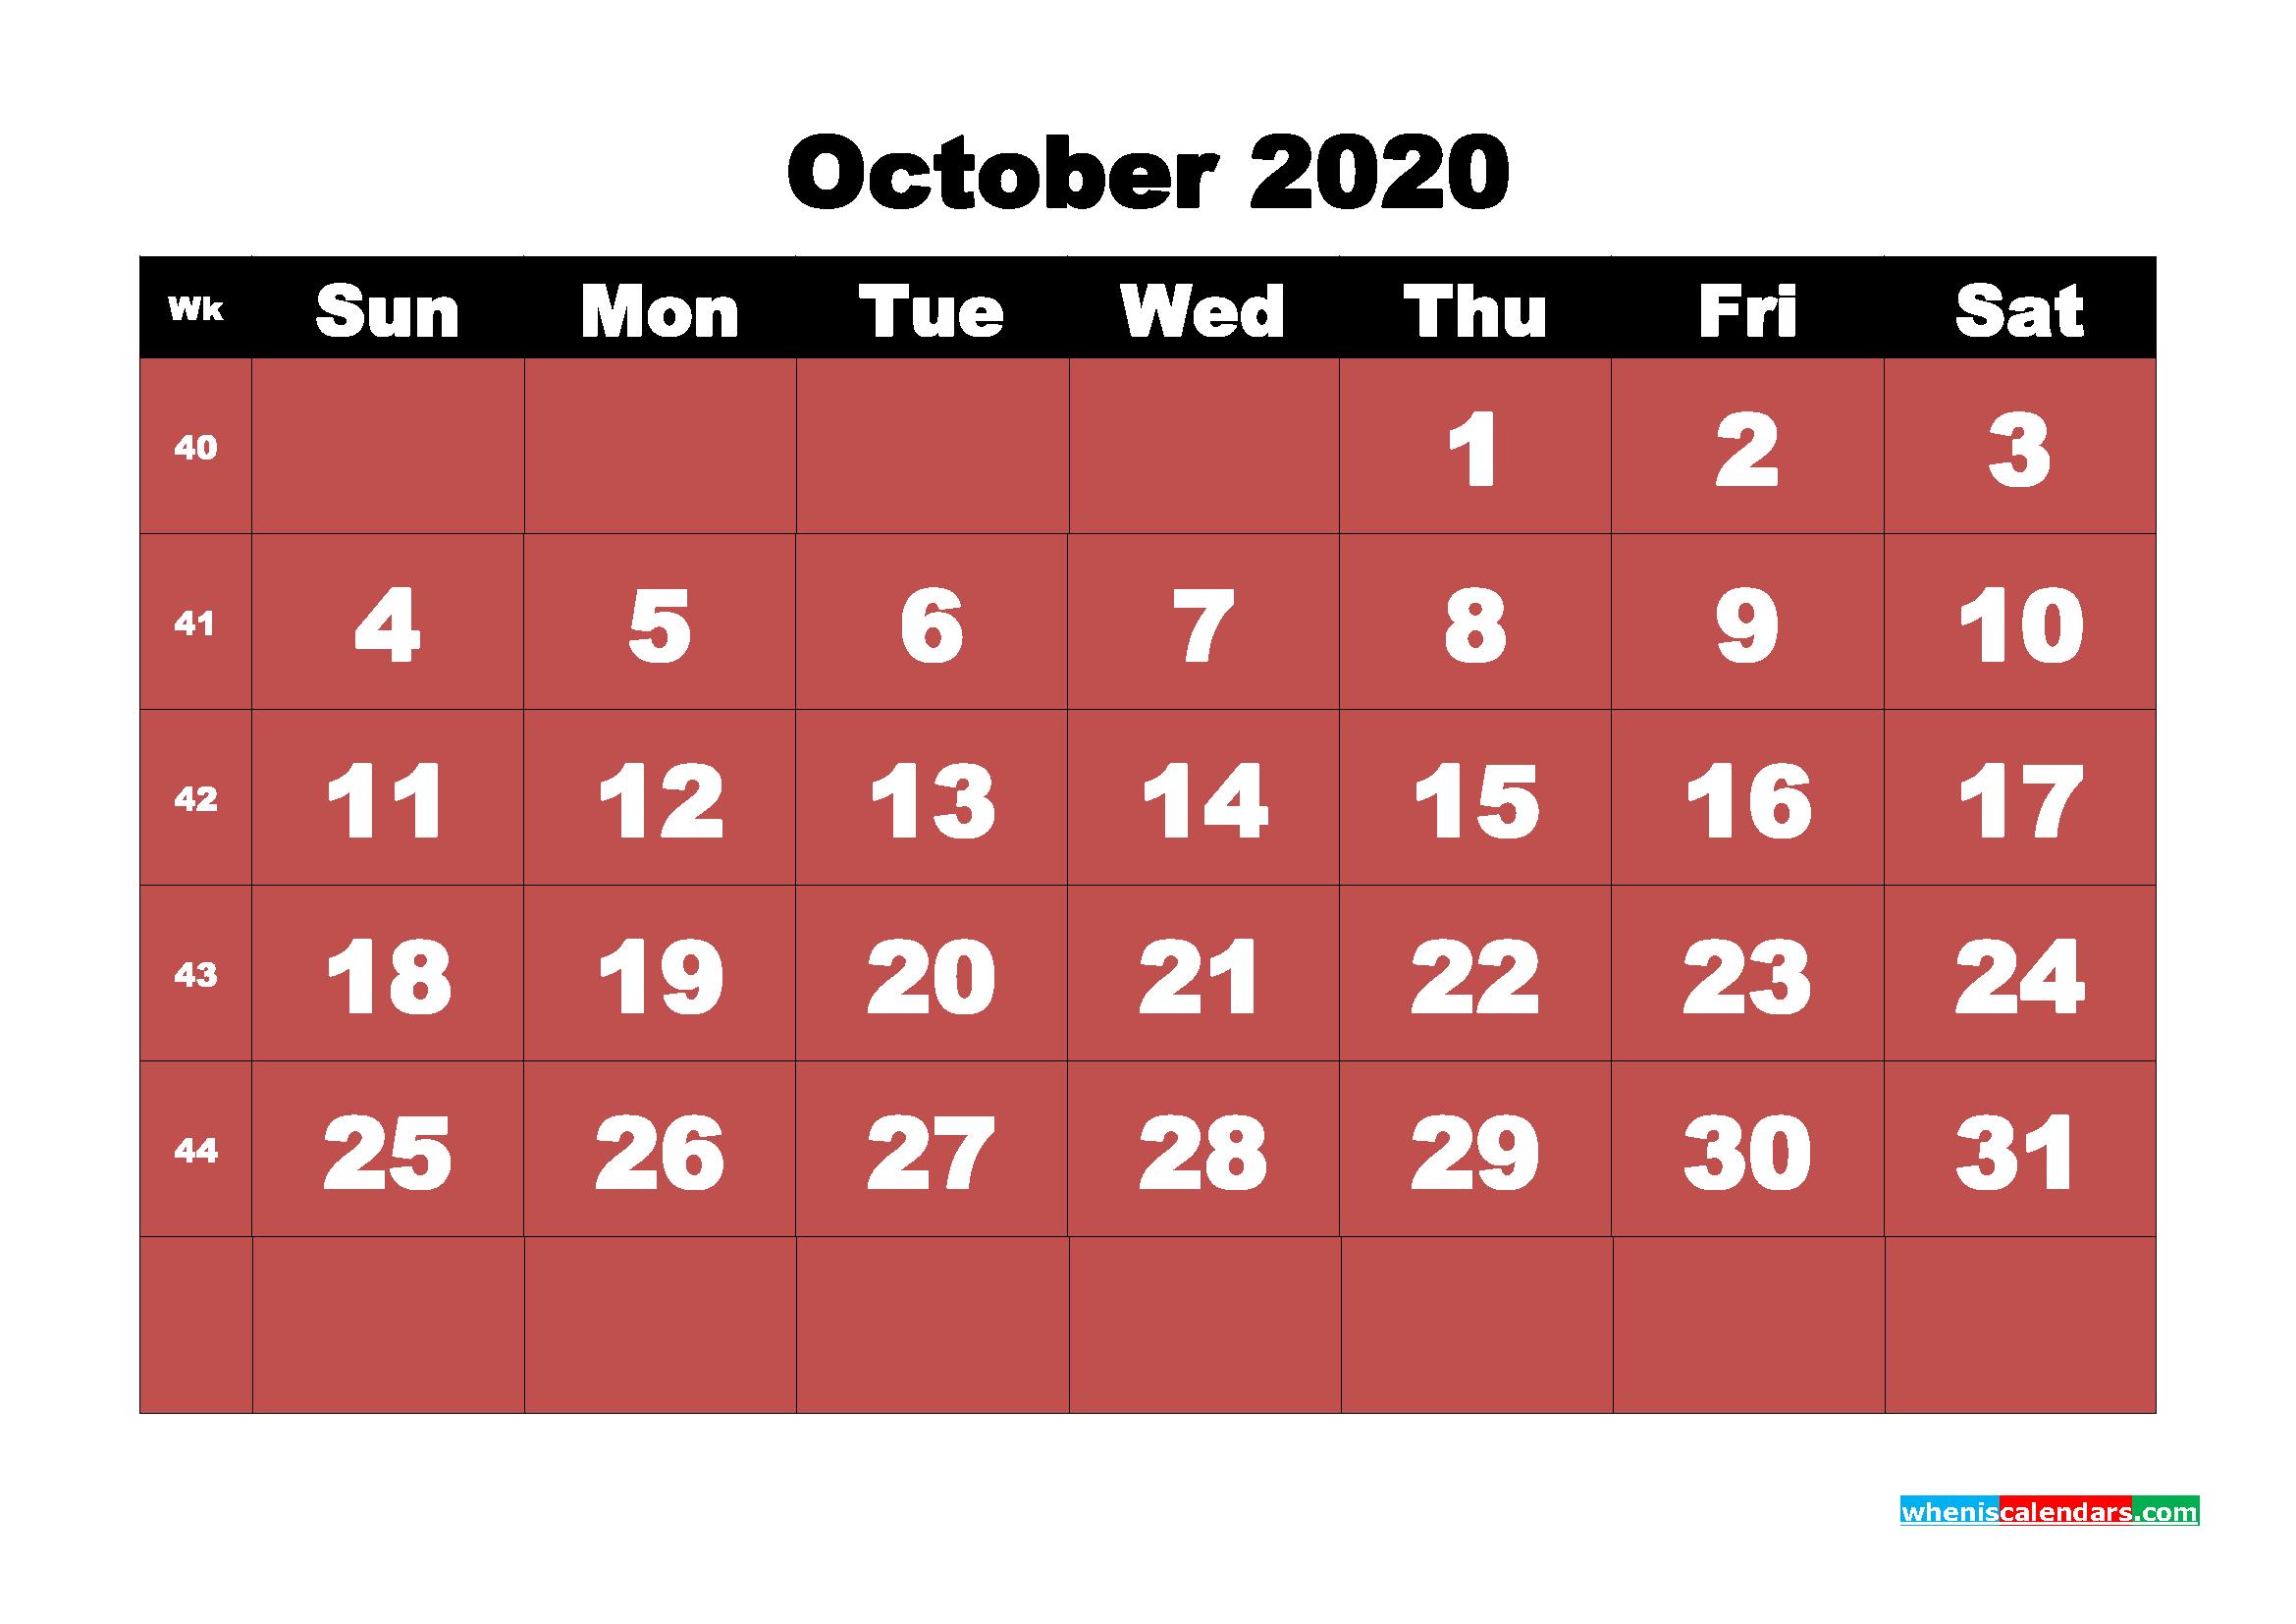 October Printable Calendar 2020 PDF, Word - No.m20b22